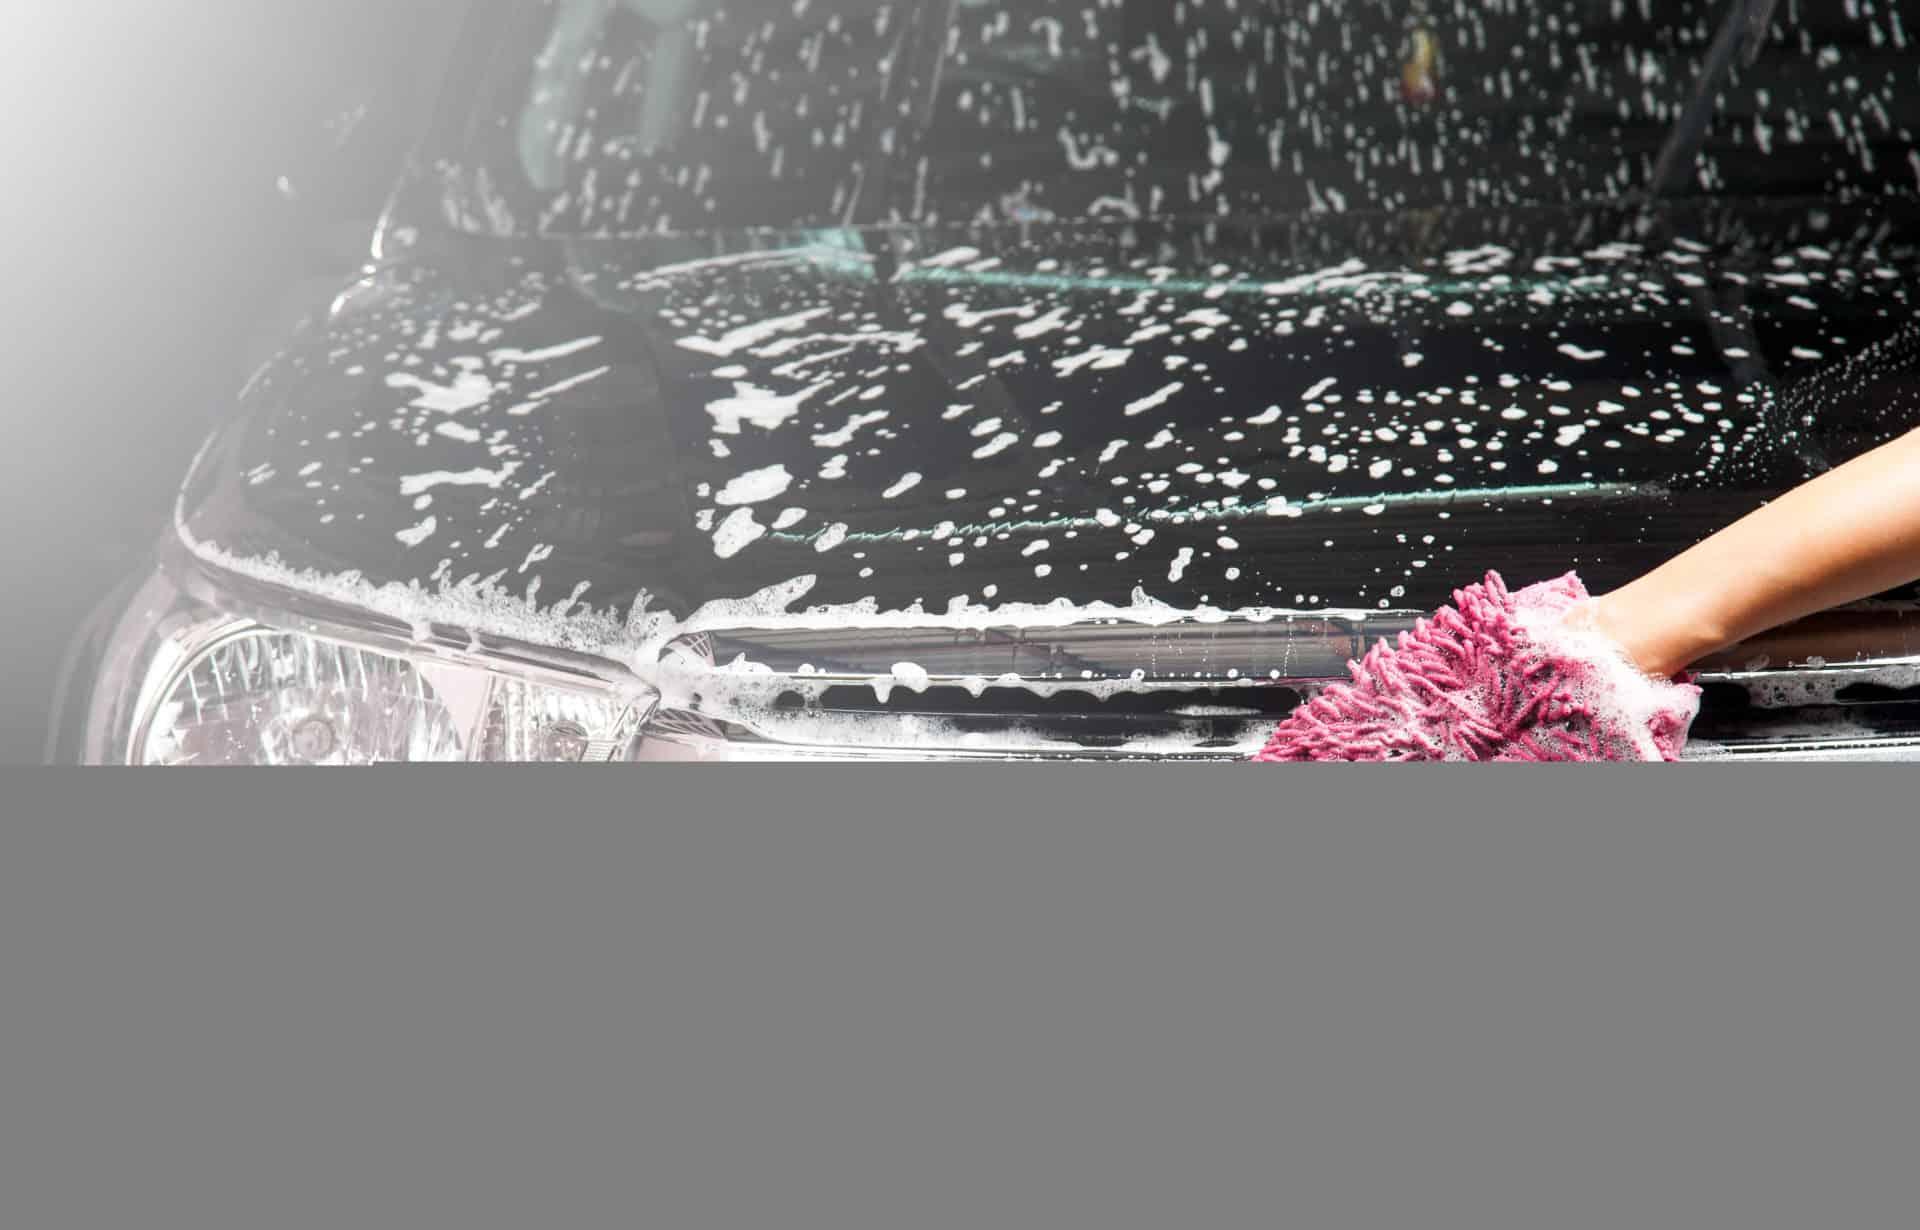 man washing a soapy black car with a cloth